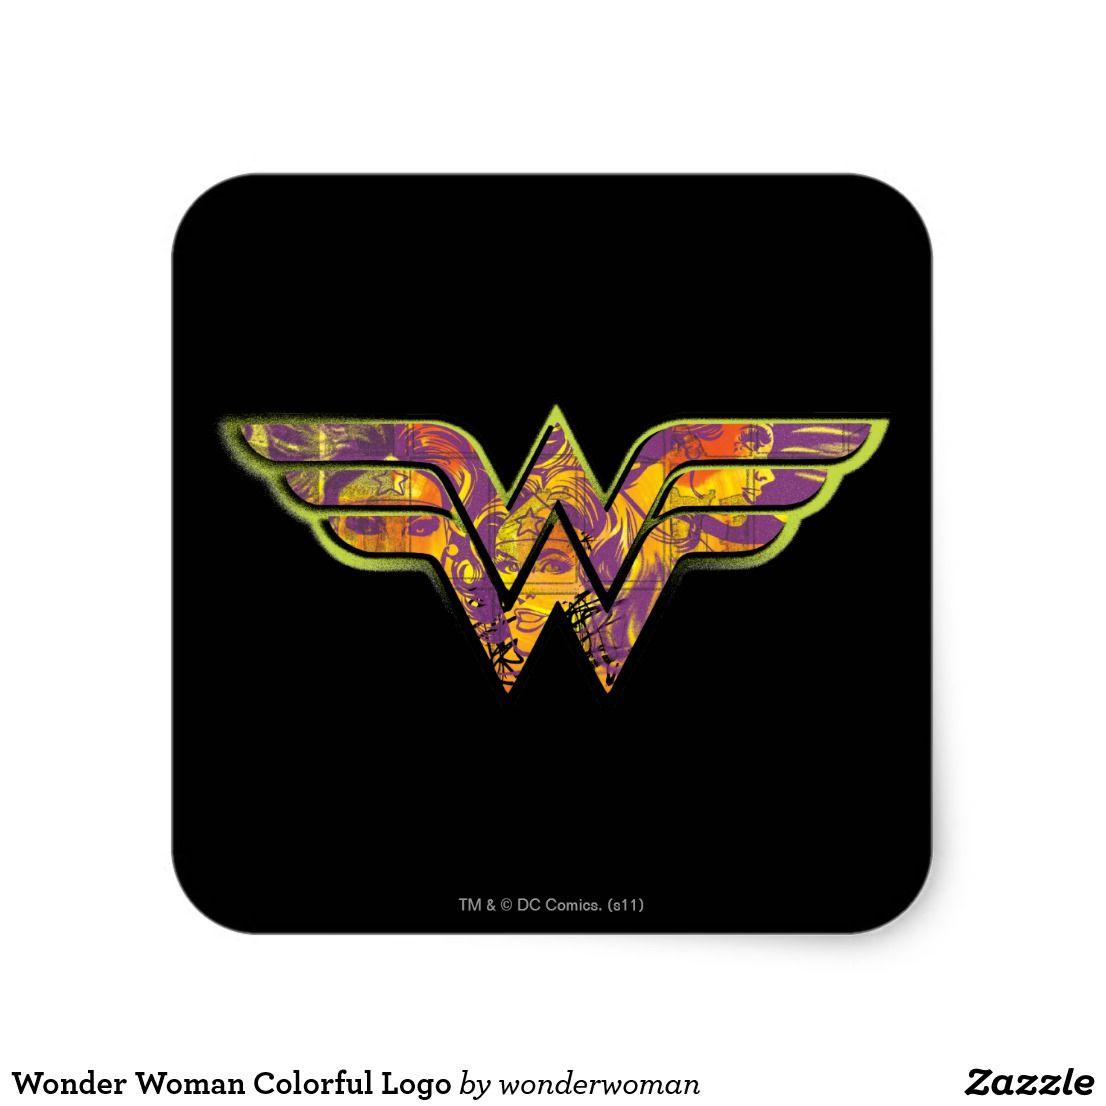 Wonder Woman Colorful Logo Square Sticker Zazzle Com Logo Color Custom Stickers Wonder Woman Design [ 1106 x 1106 Pixel ]